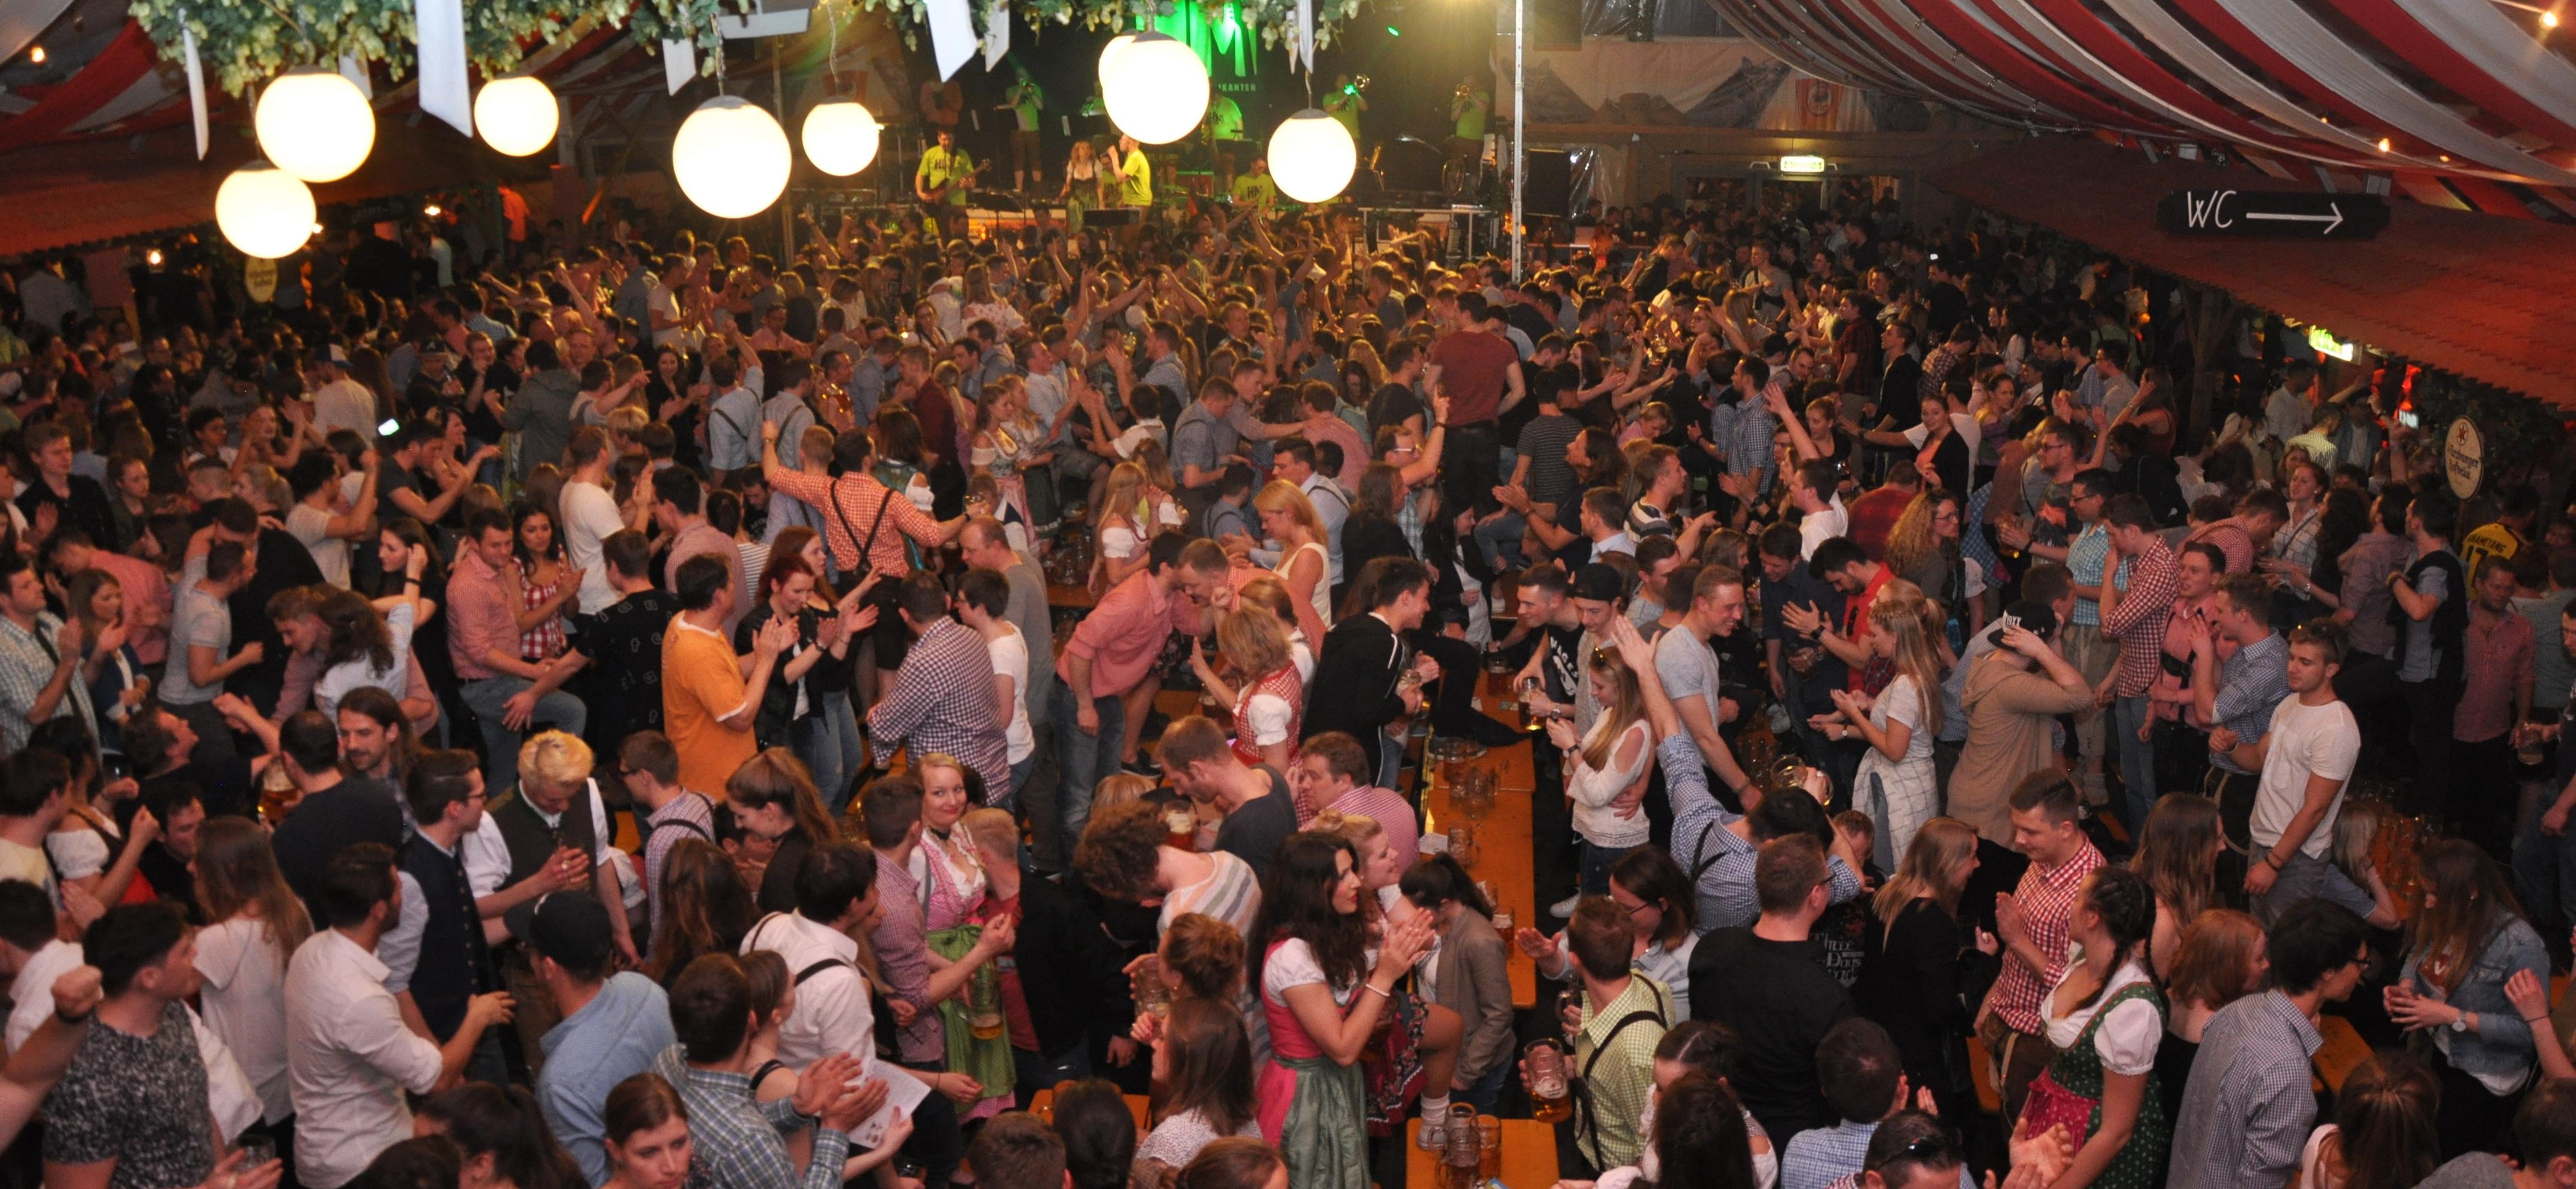 Frühjahrsvolksfest Würzburg 2017